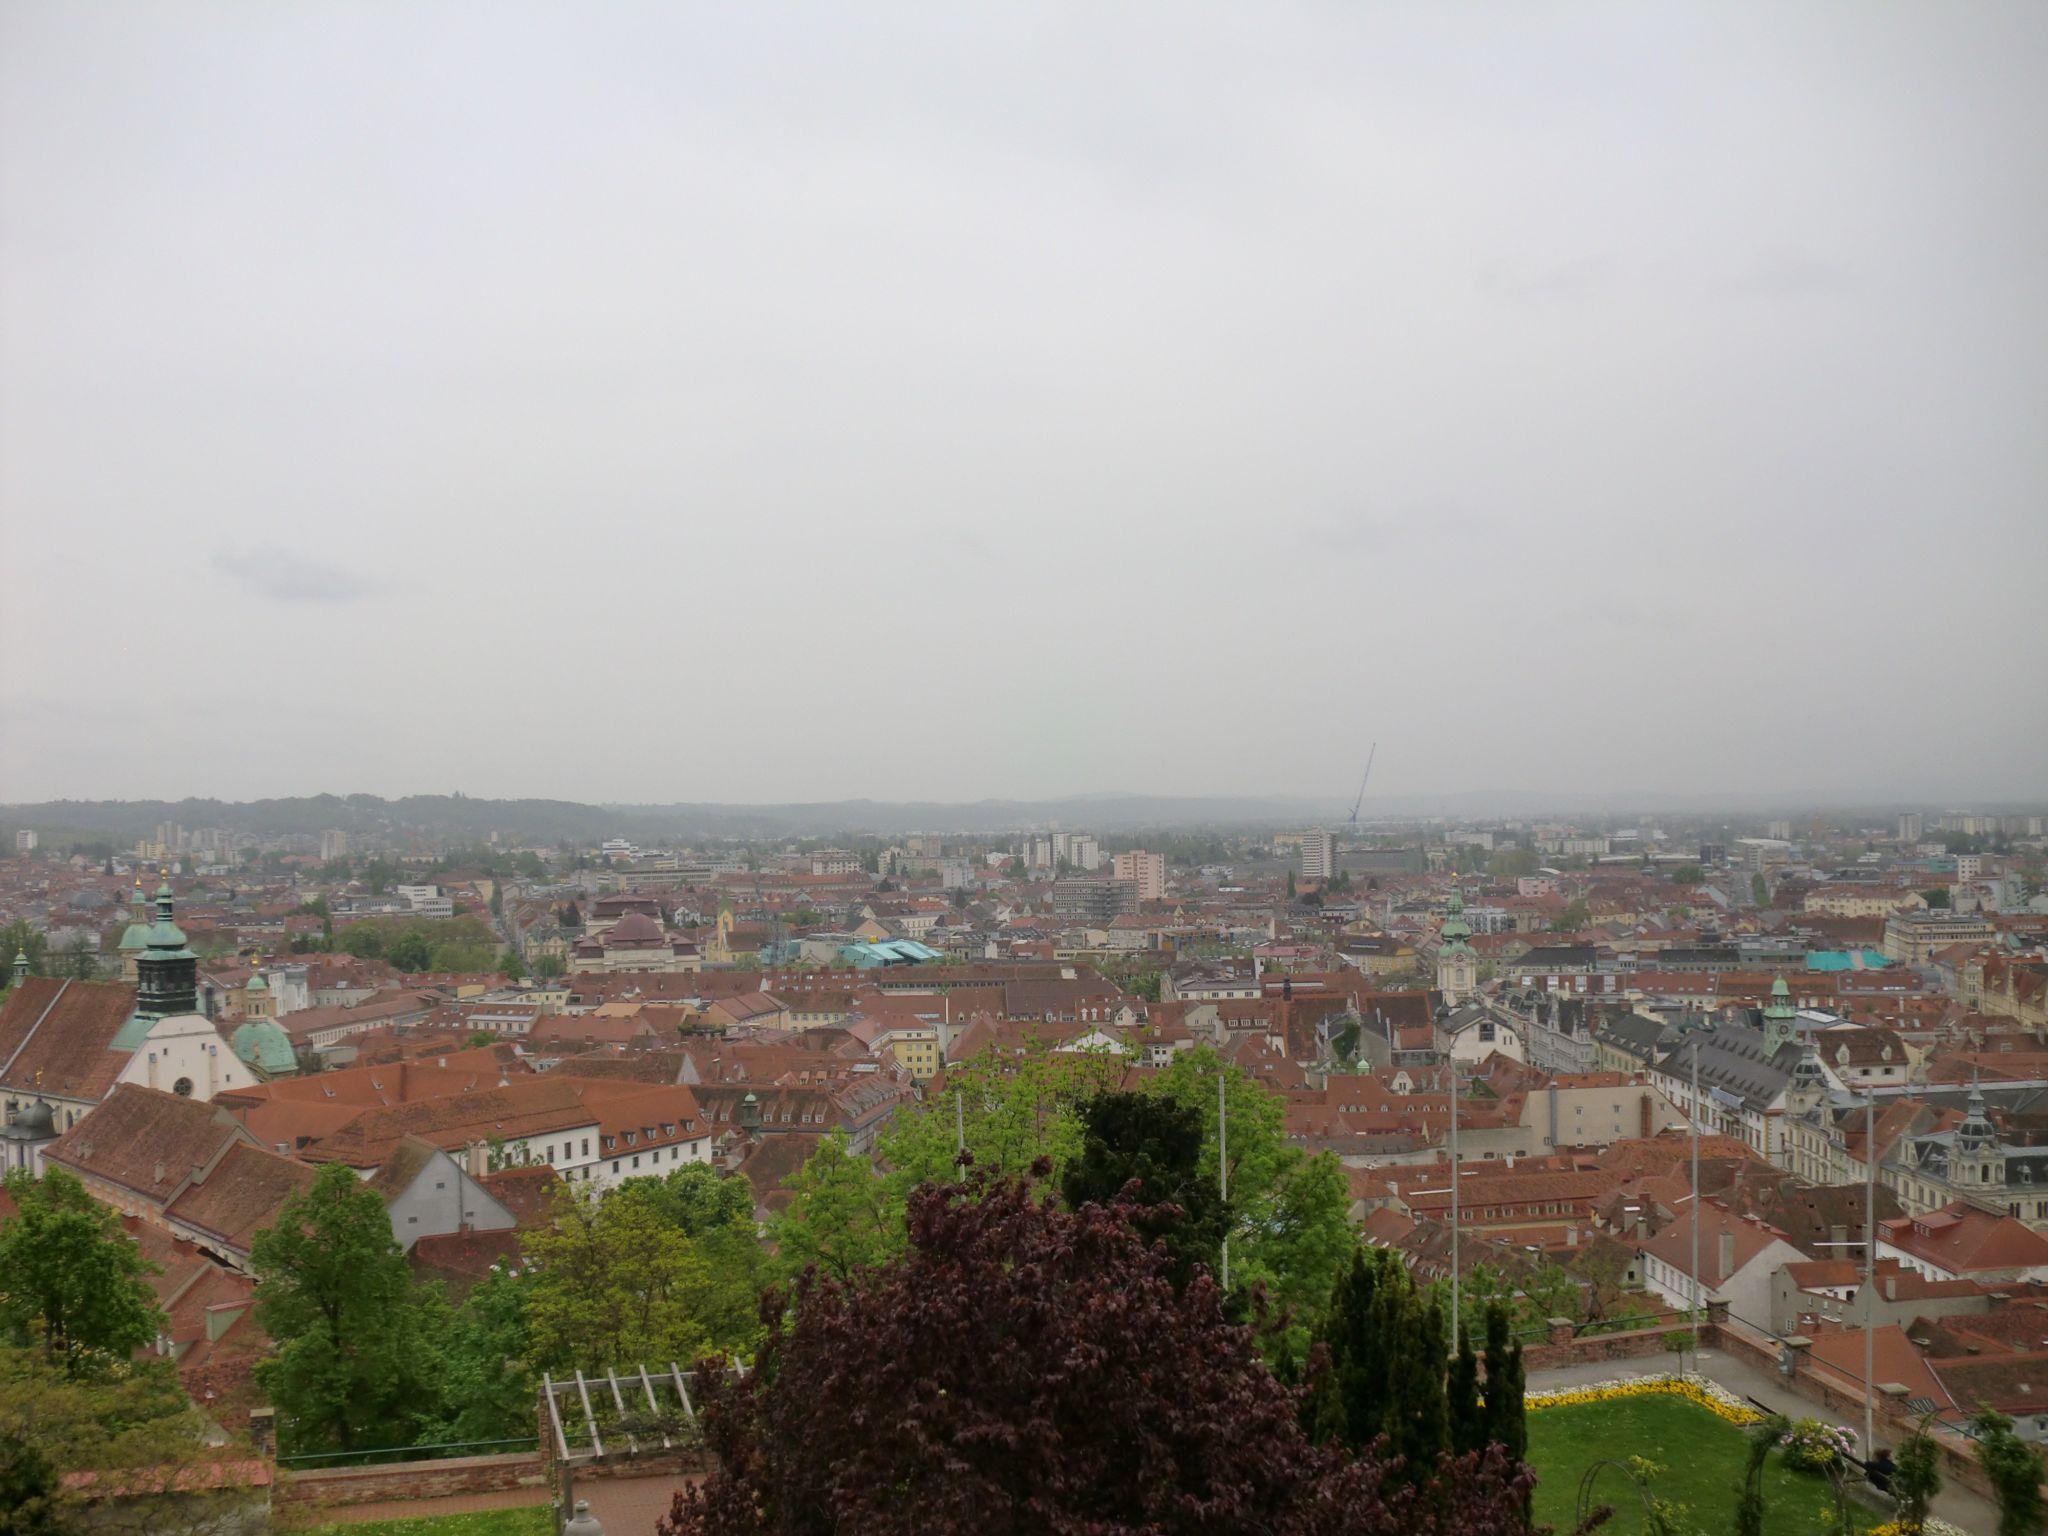 Graz view 10 - Graz: tradition and modernity